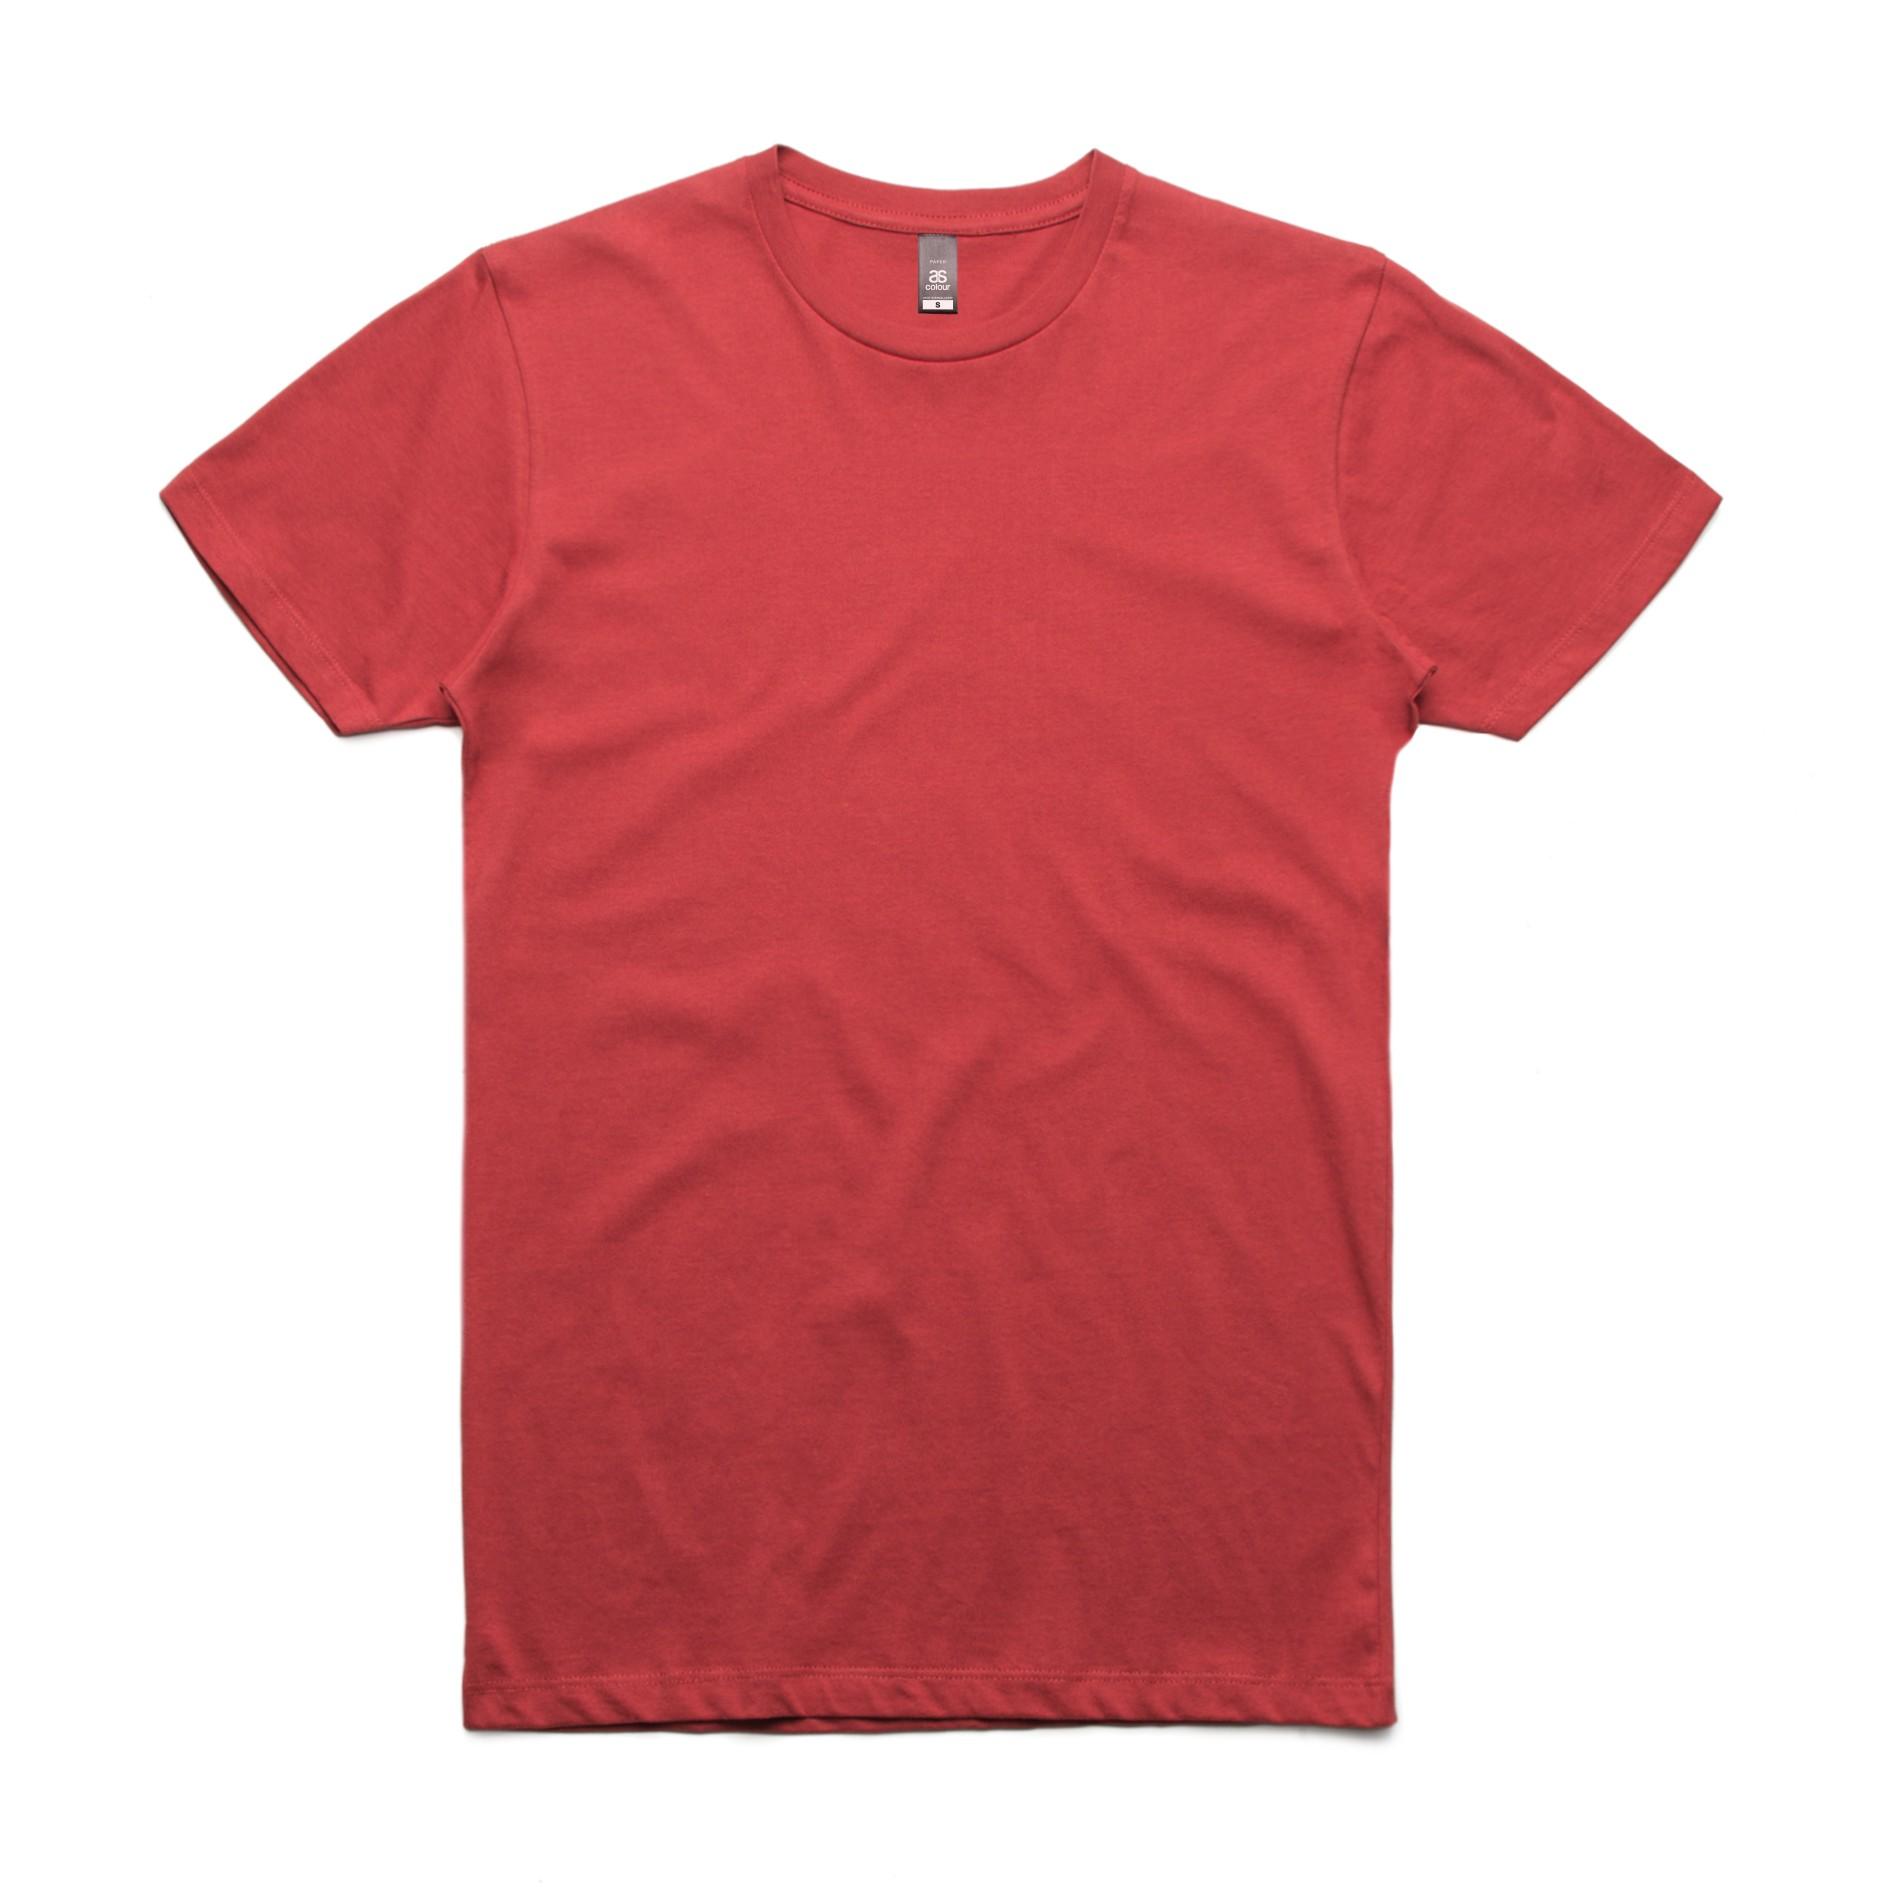 Mens T-Shirts and Singlets